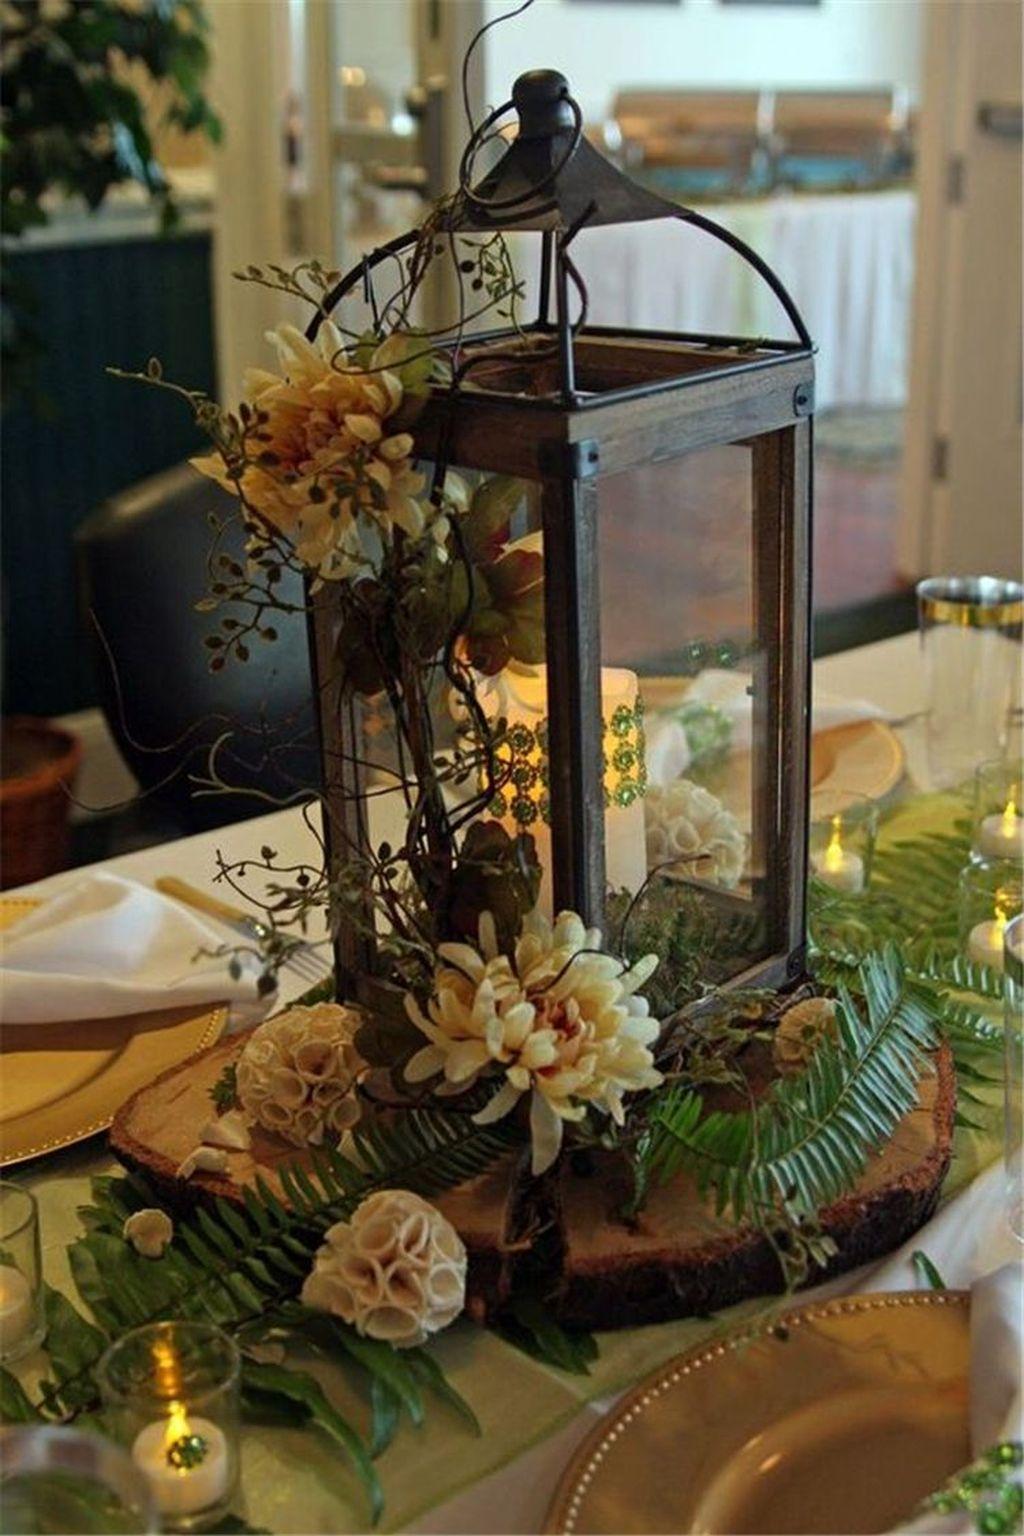 31 Gorgeous Winter Lantern Centerpieces Ideas Best For Dining Room Decor Lantern Centerpiece Wedding Table Flower Arrangements Wedding Decorations Centerpieces